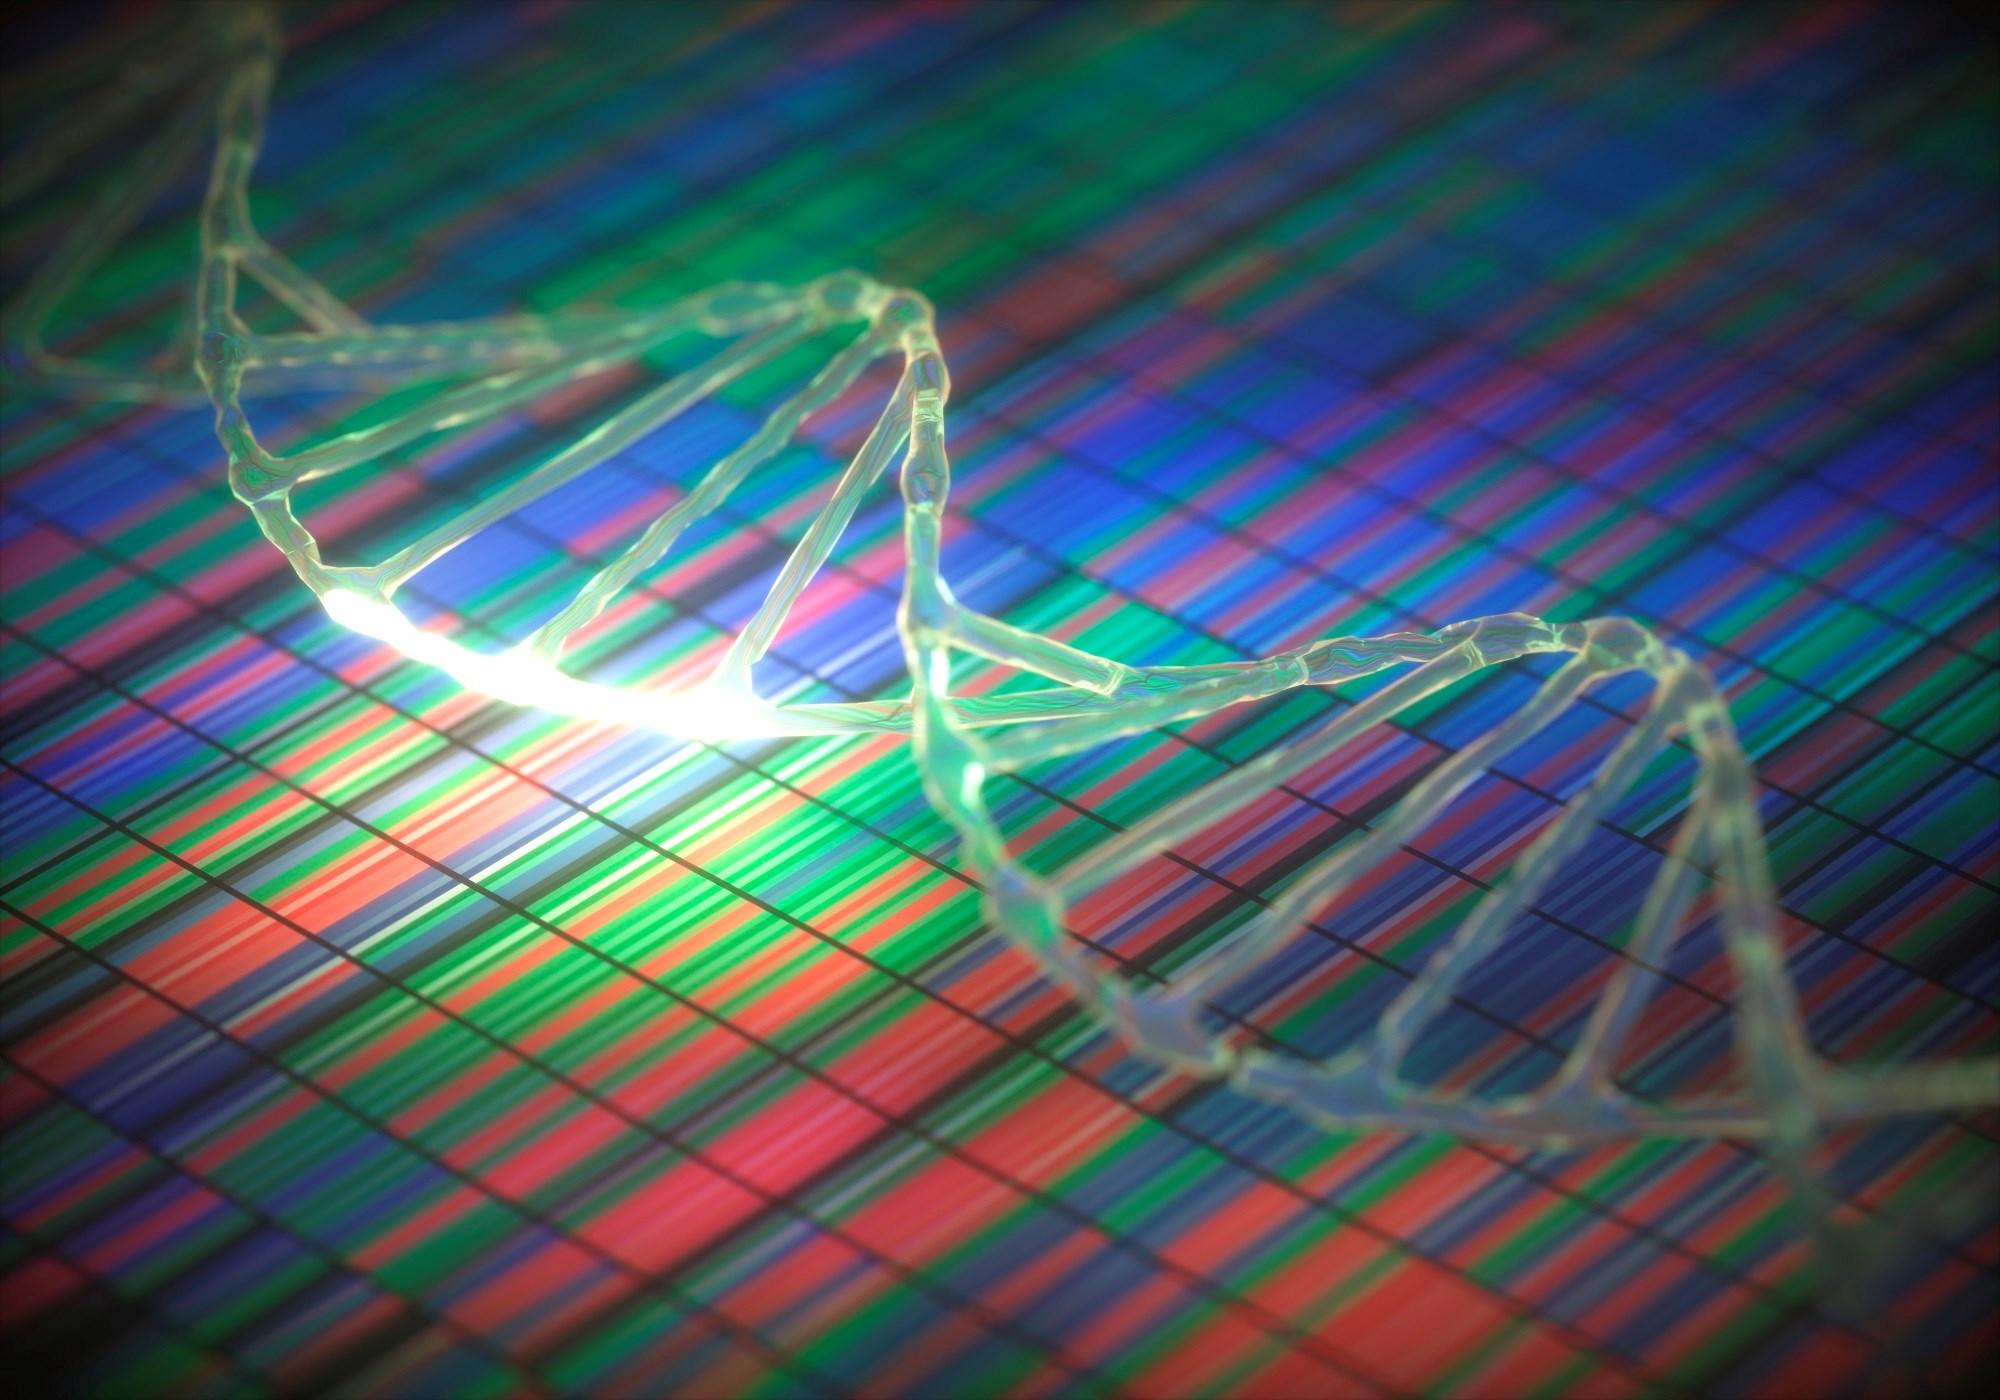 Age, Sex, APOE Genotype Identify Alzheimer's, Dementia Risk